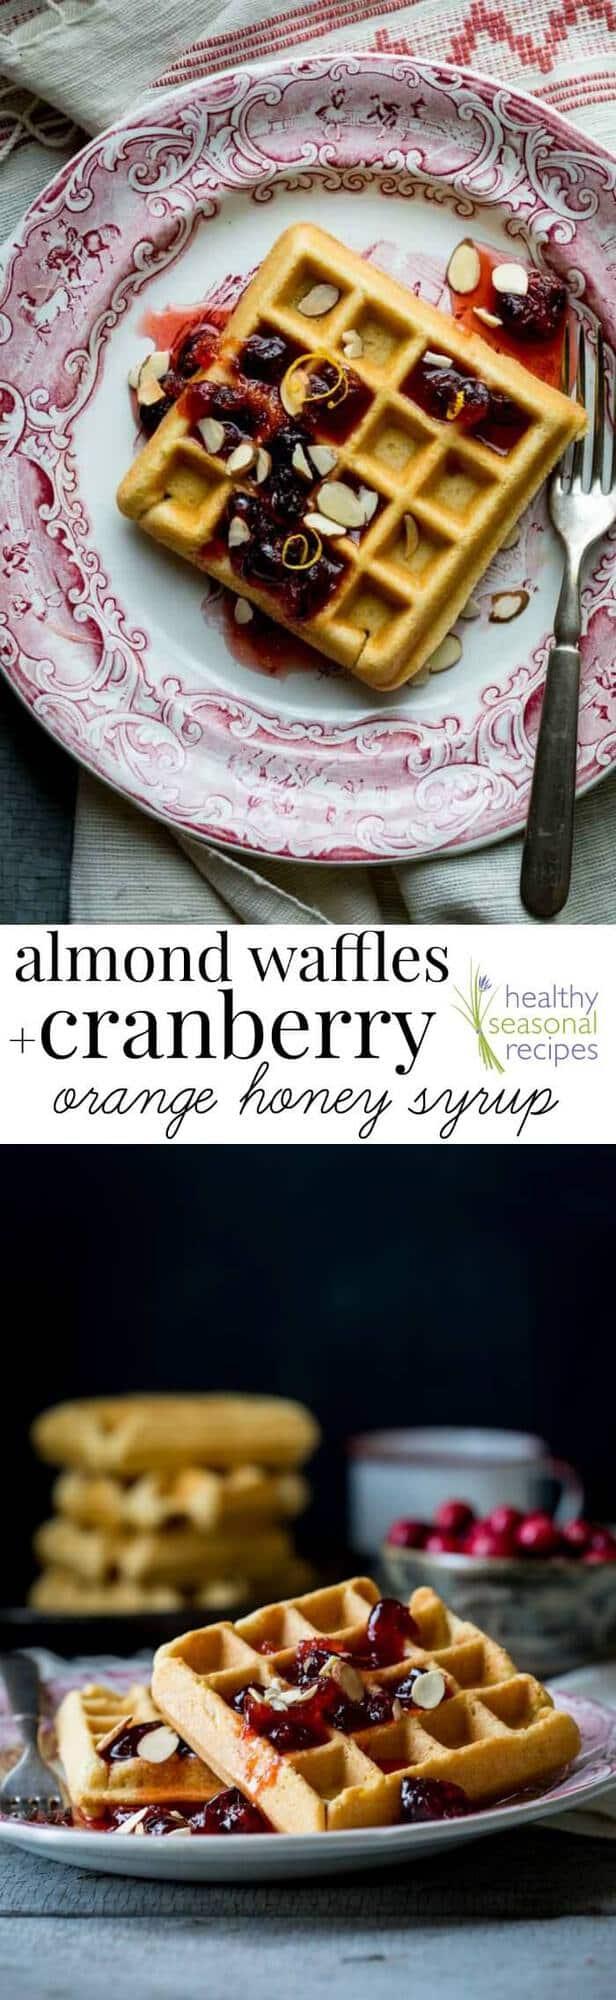 almond waffles with cranberry orange honey syrup